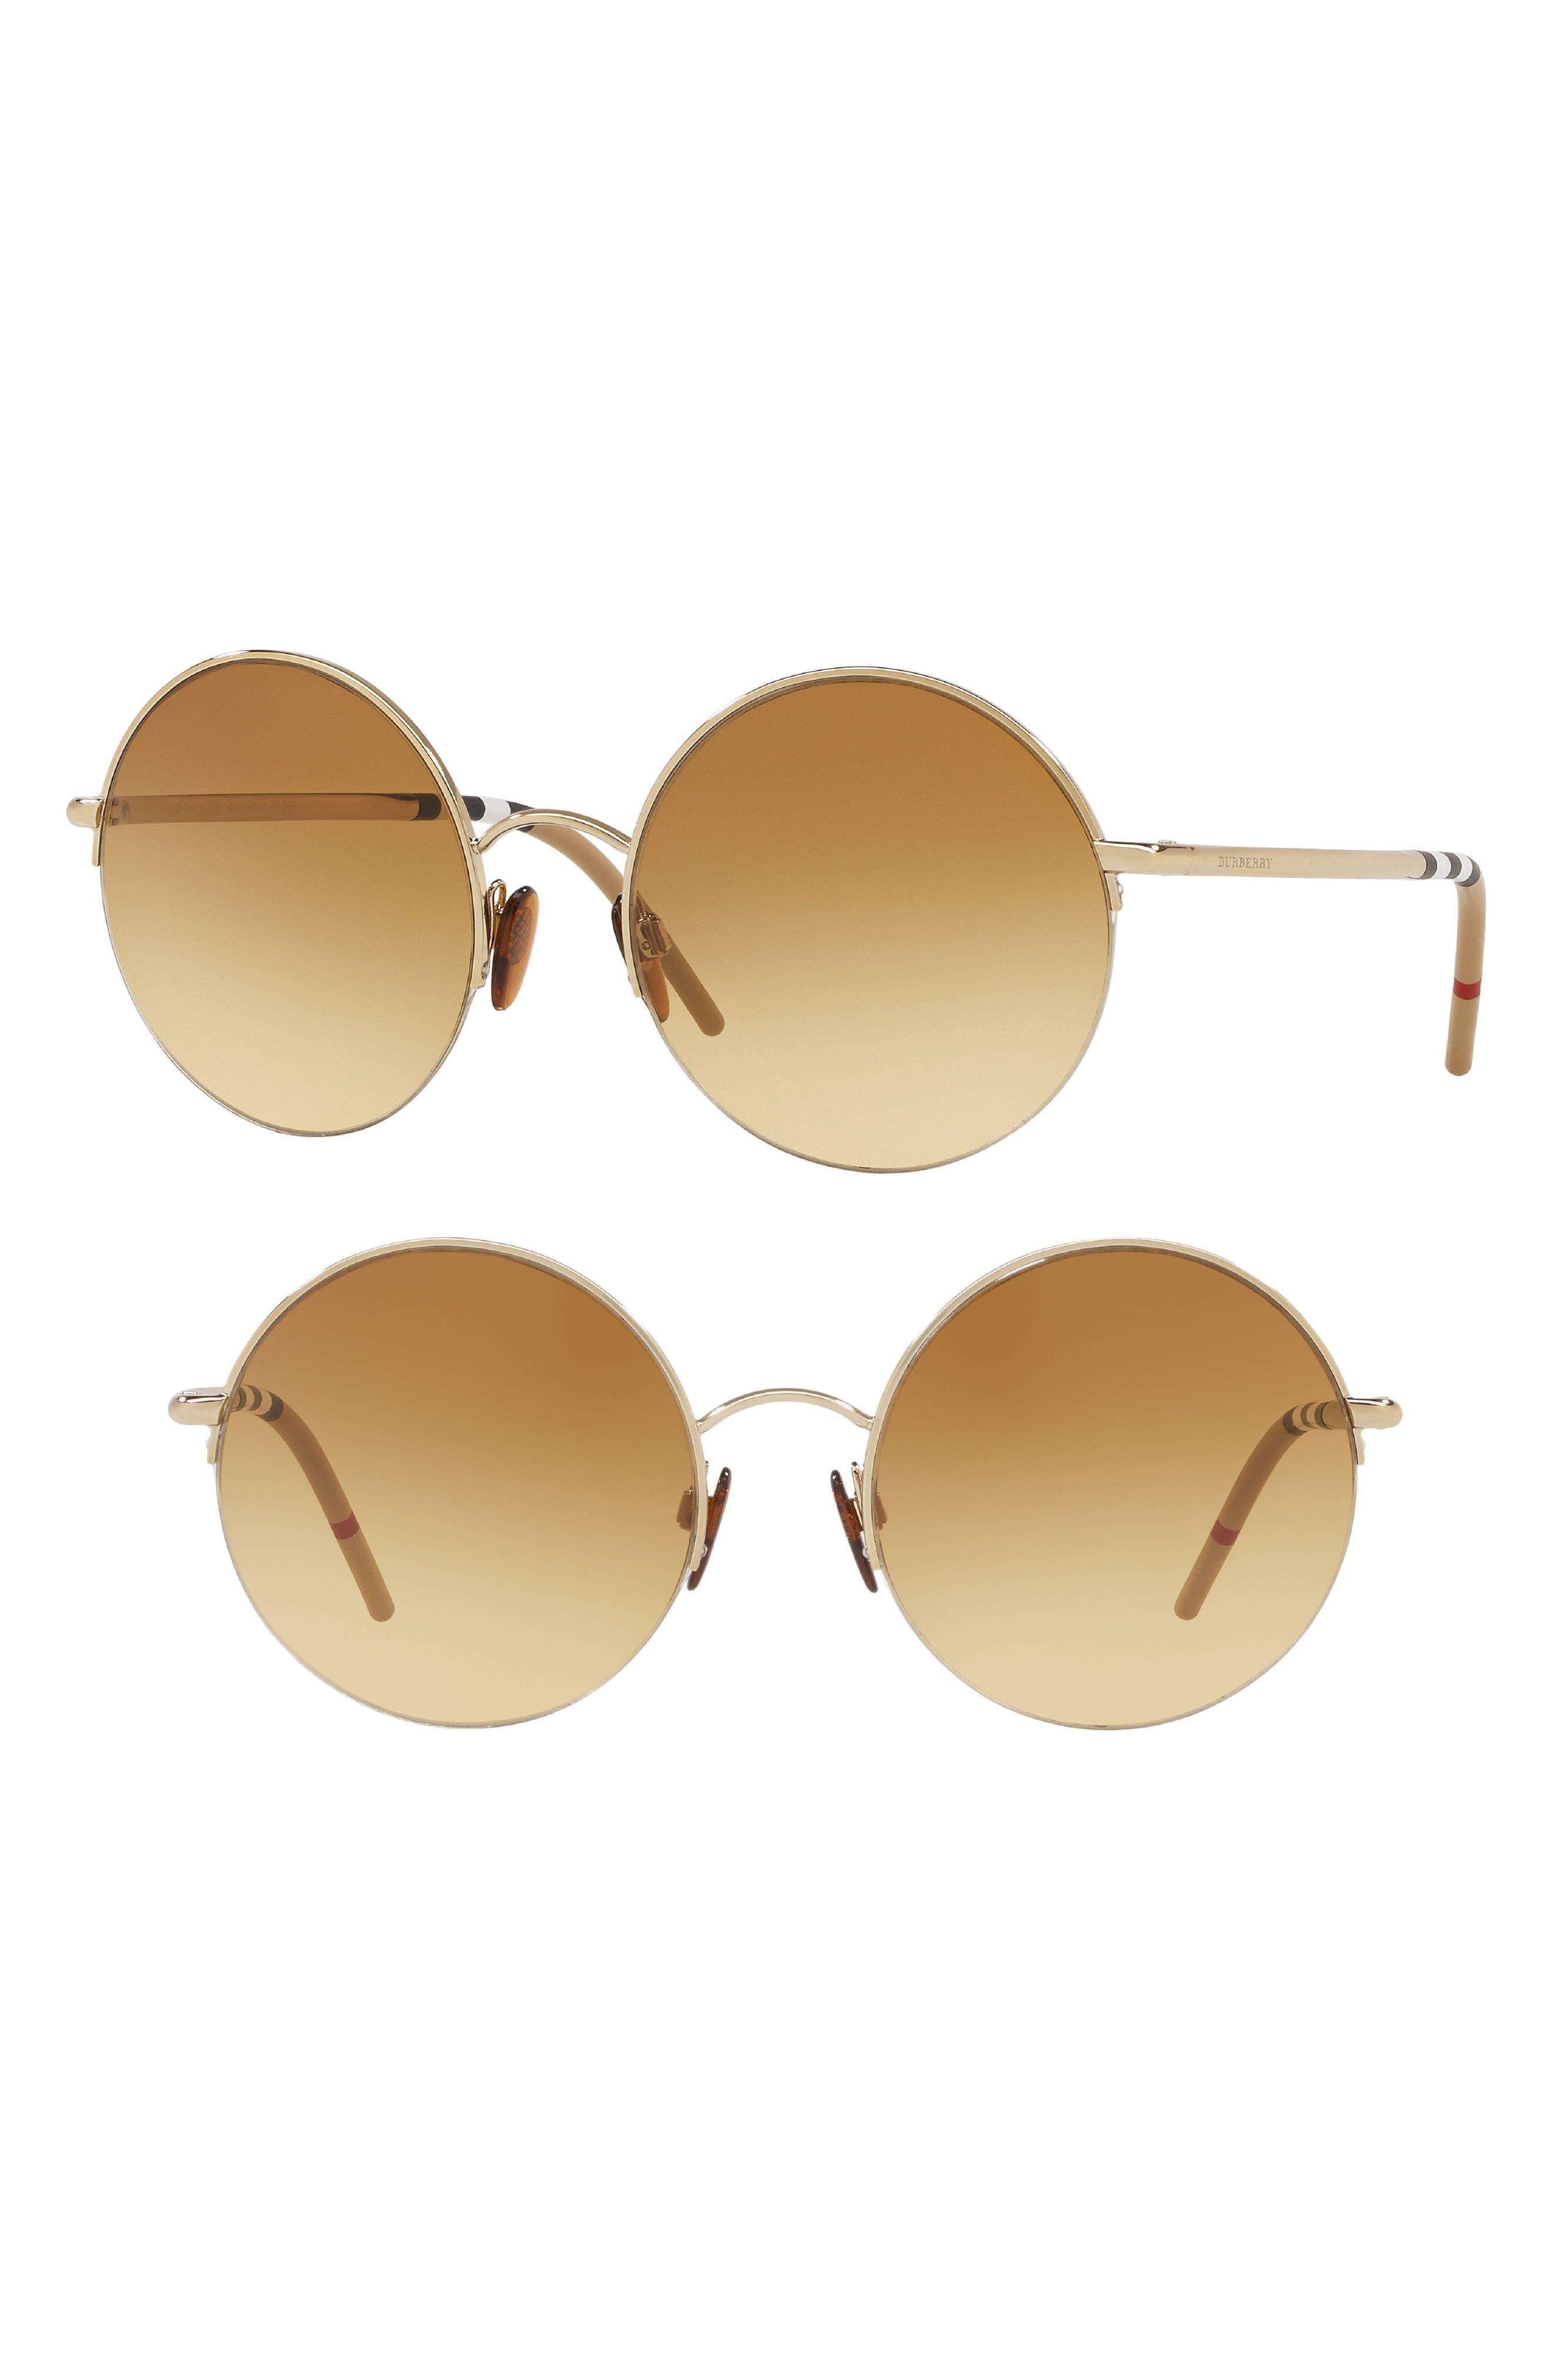 54mm Round Sunglasses,                         Main,                         color, GOLD GRADIENT